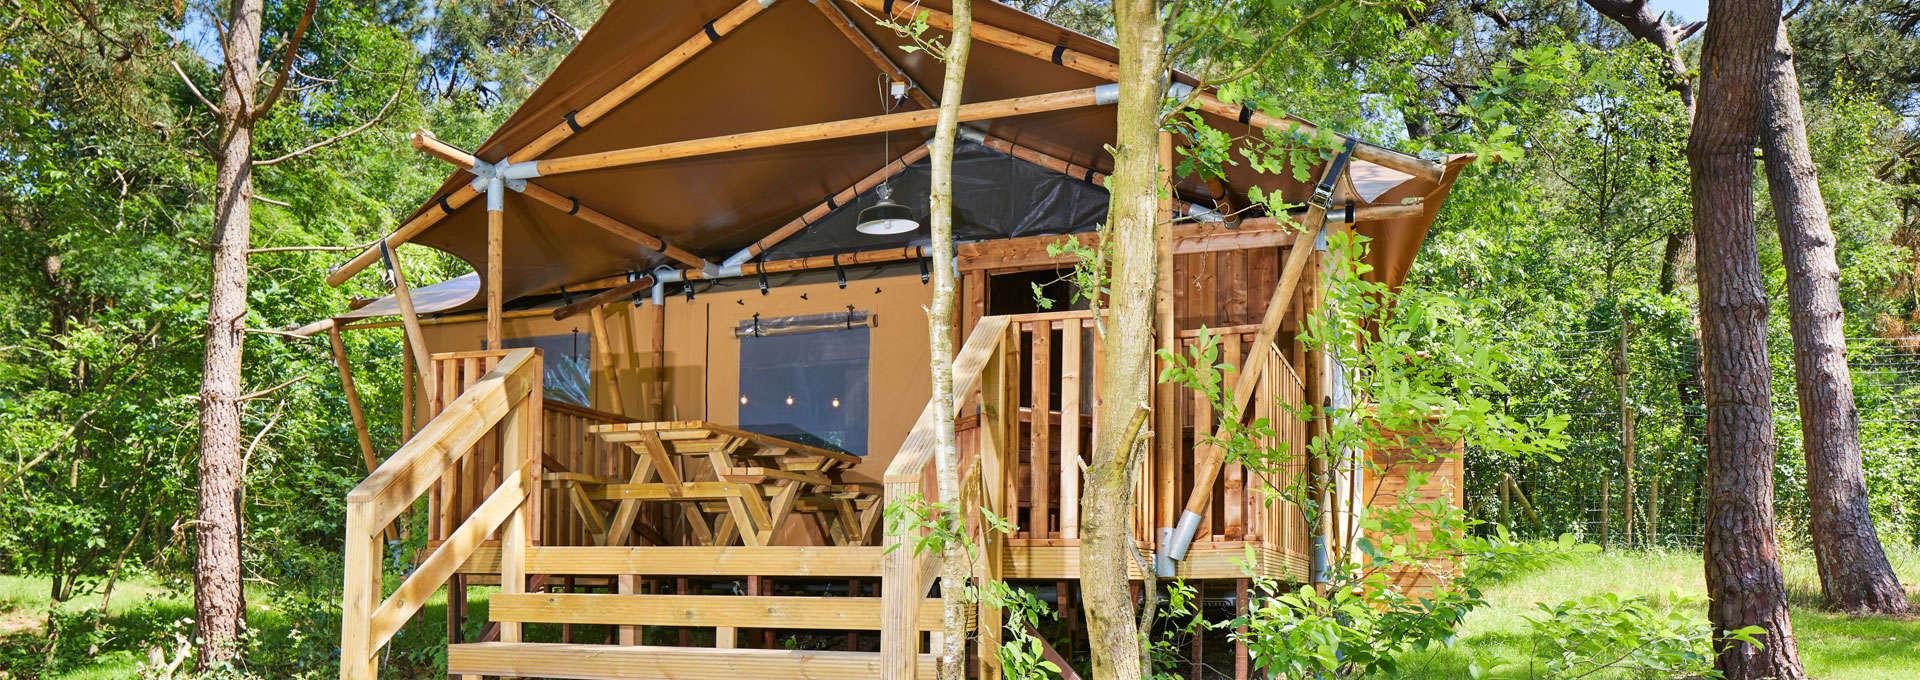 Glamping in den Luxus Lodgezelten in Duinrell Blog